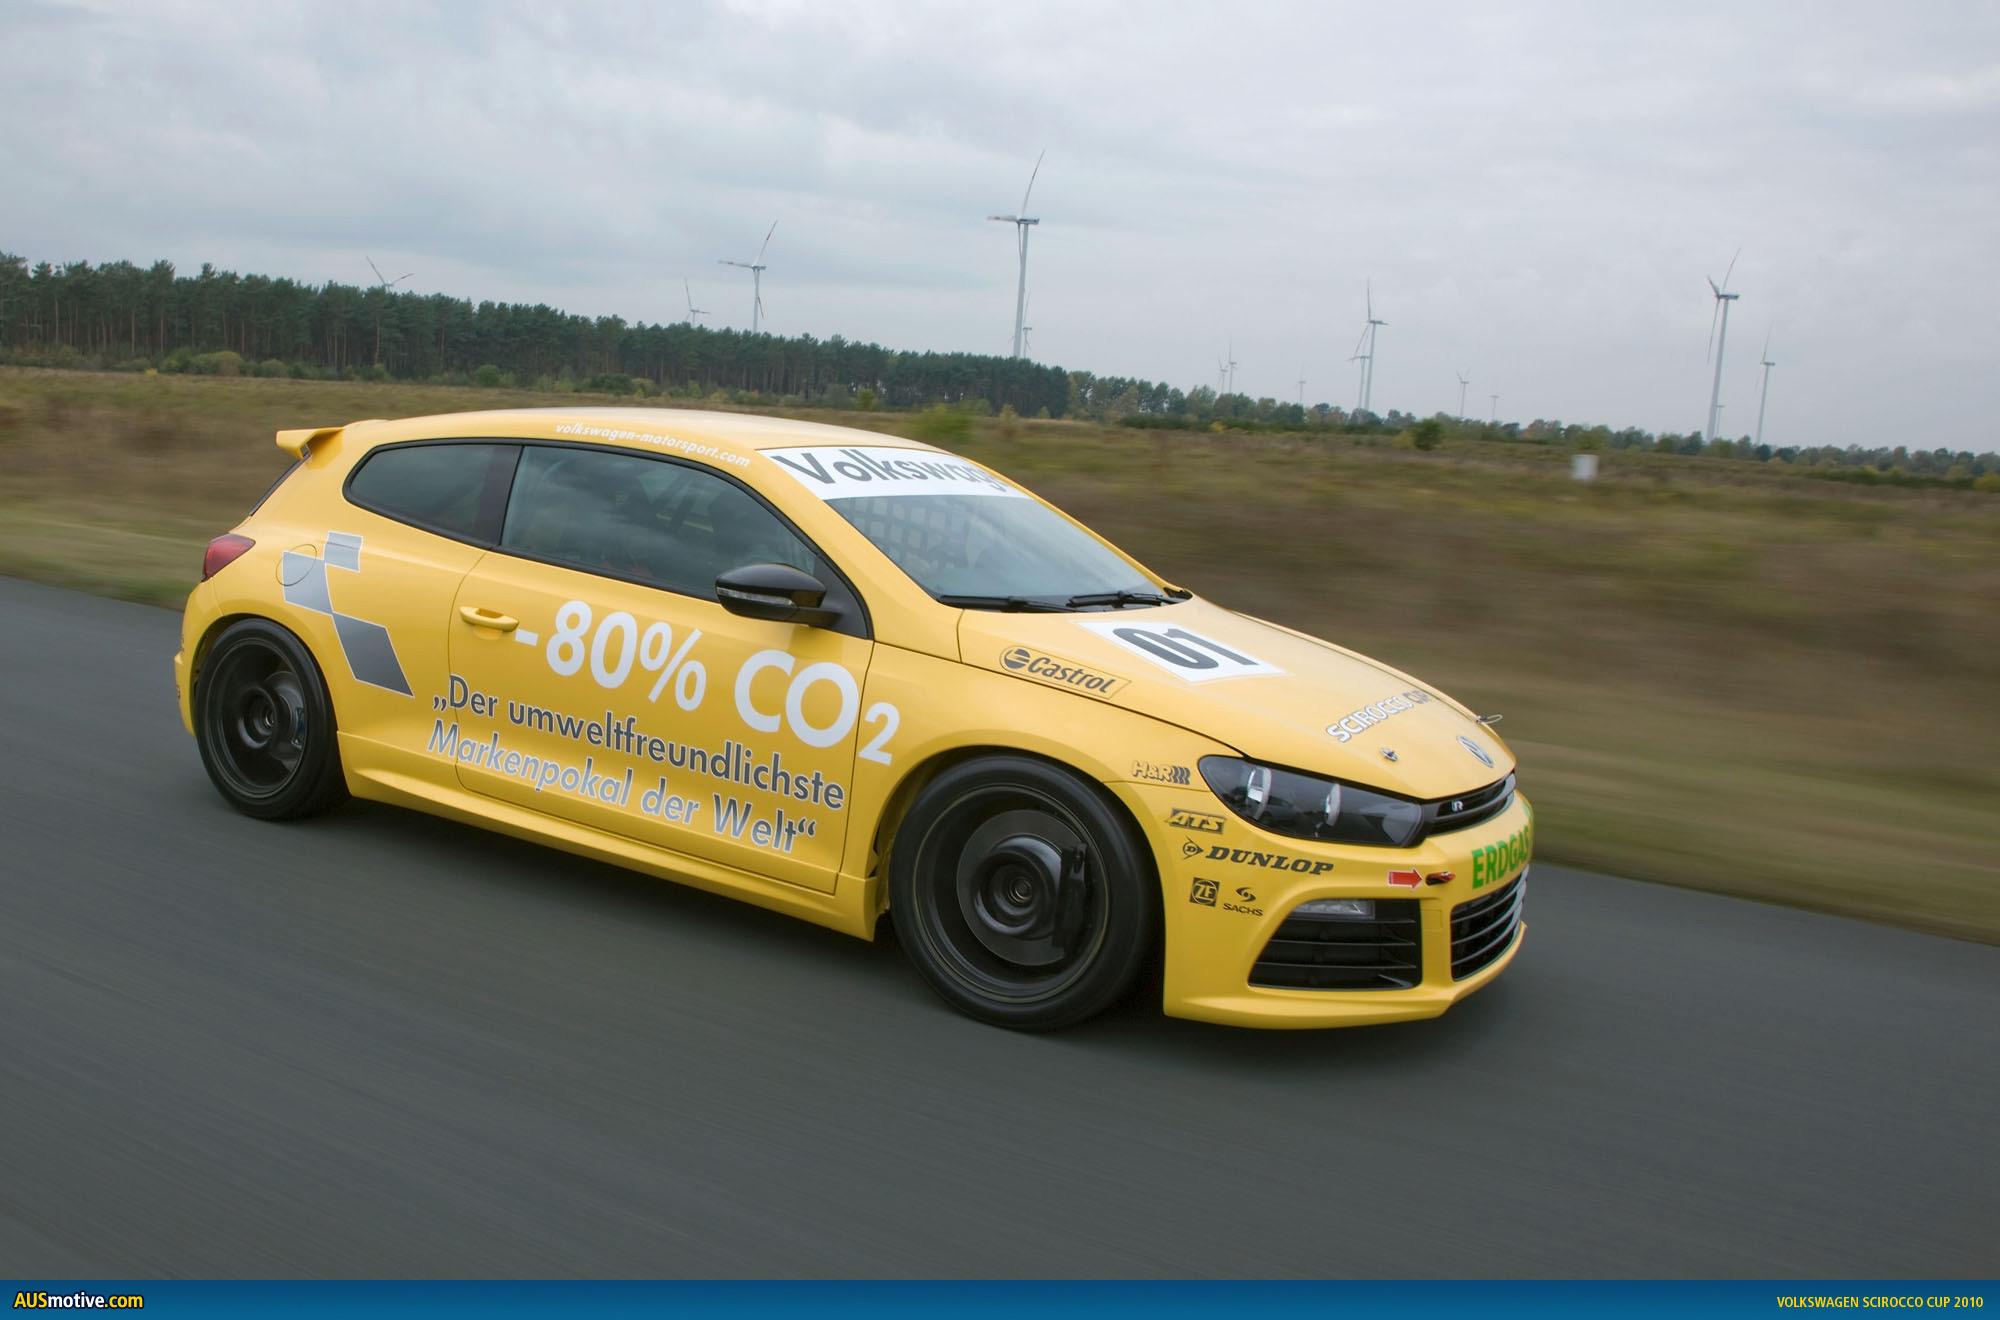 Volkswagen scirocco for sale in usa - Volkswagen Scirocco Cup